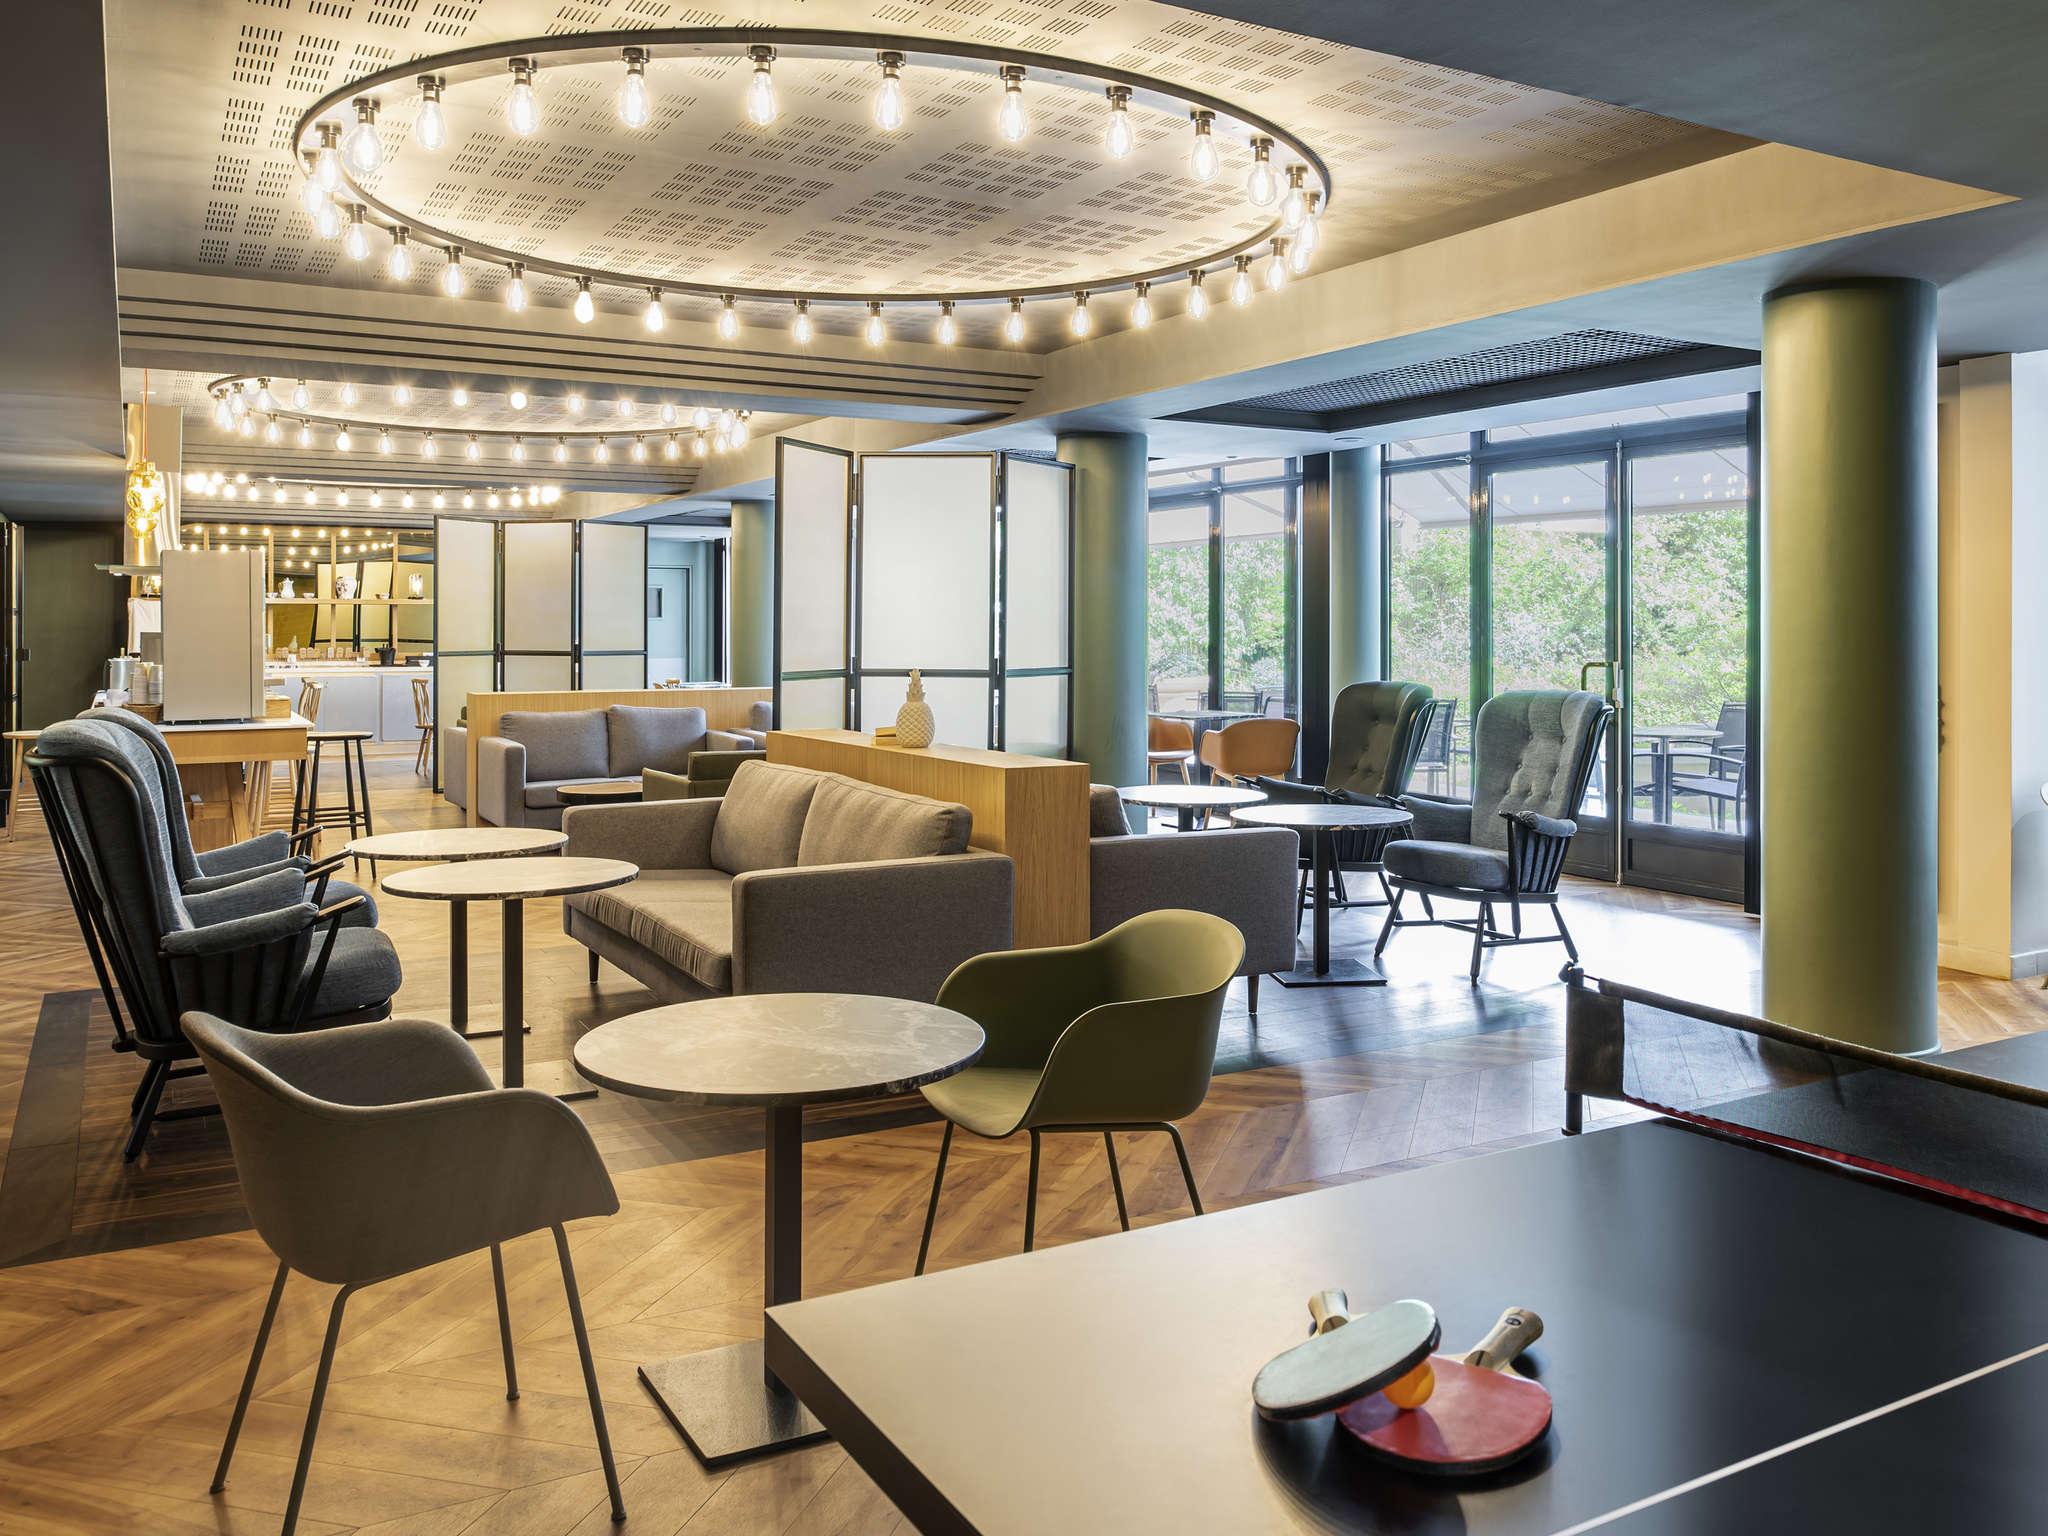 Hotell – Lägenhetshotellet Adagio Porte de Versailles